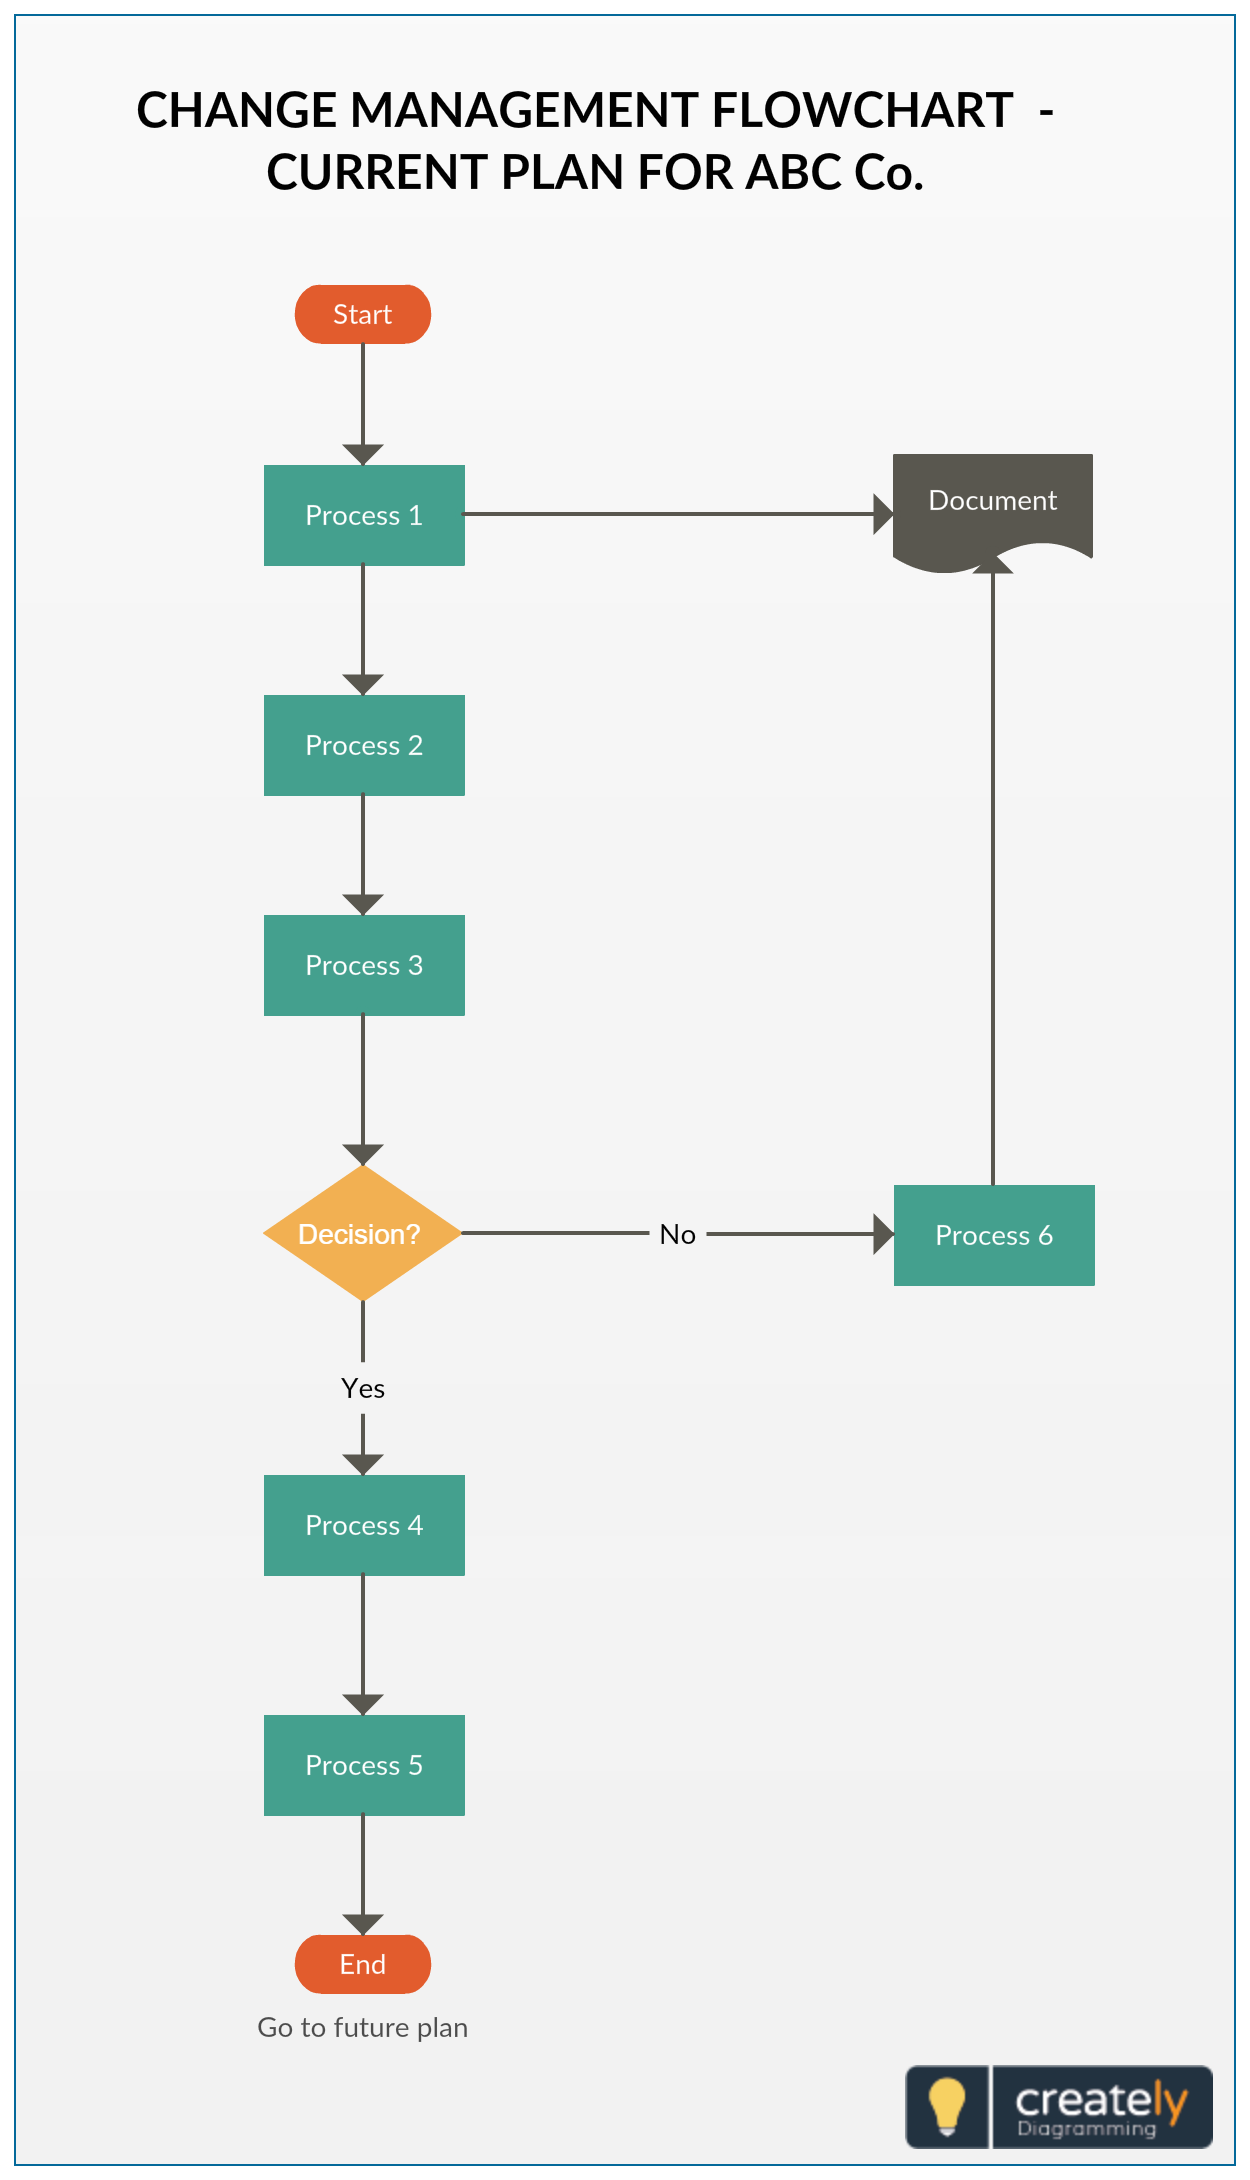 Change Management Flowchart illustrating the process of